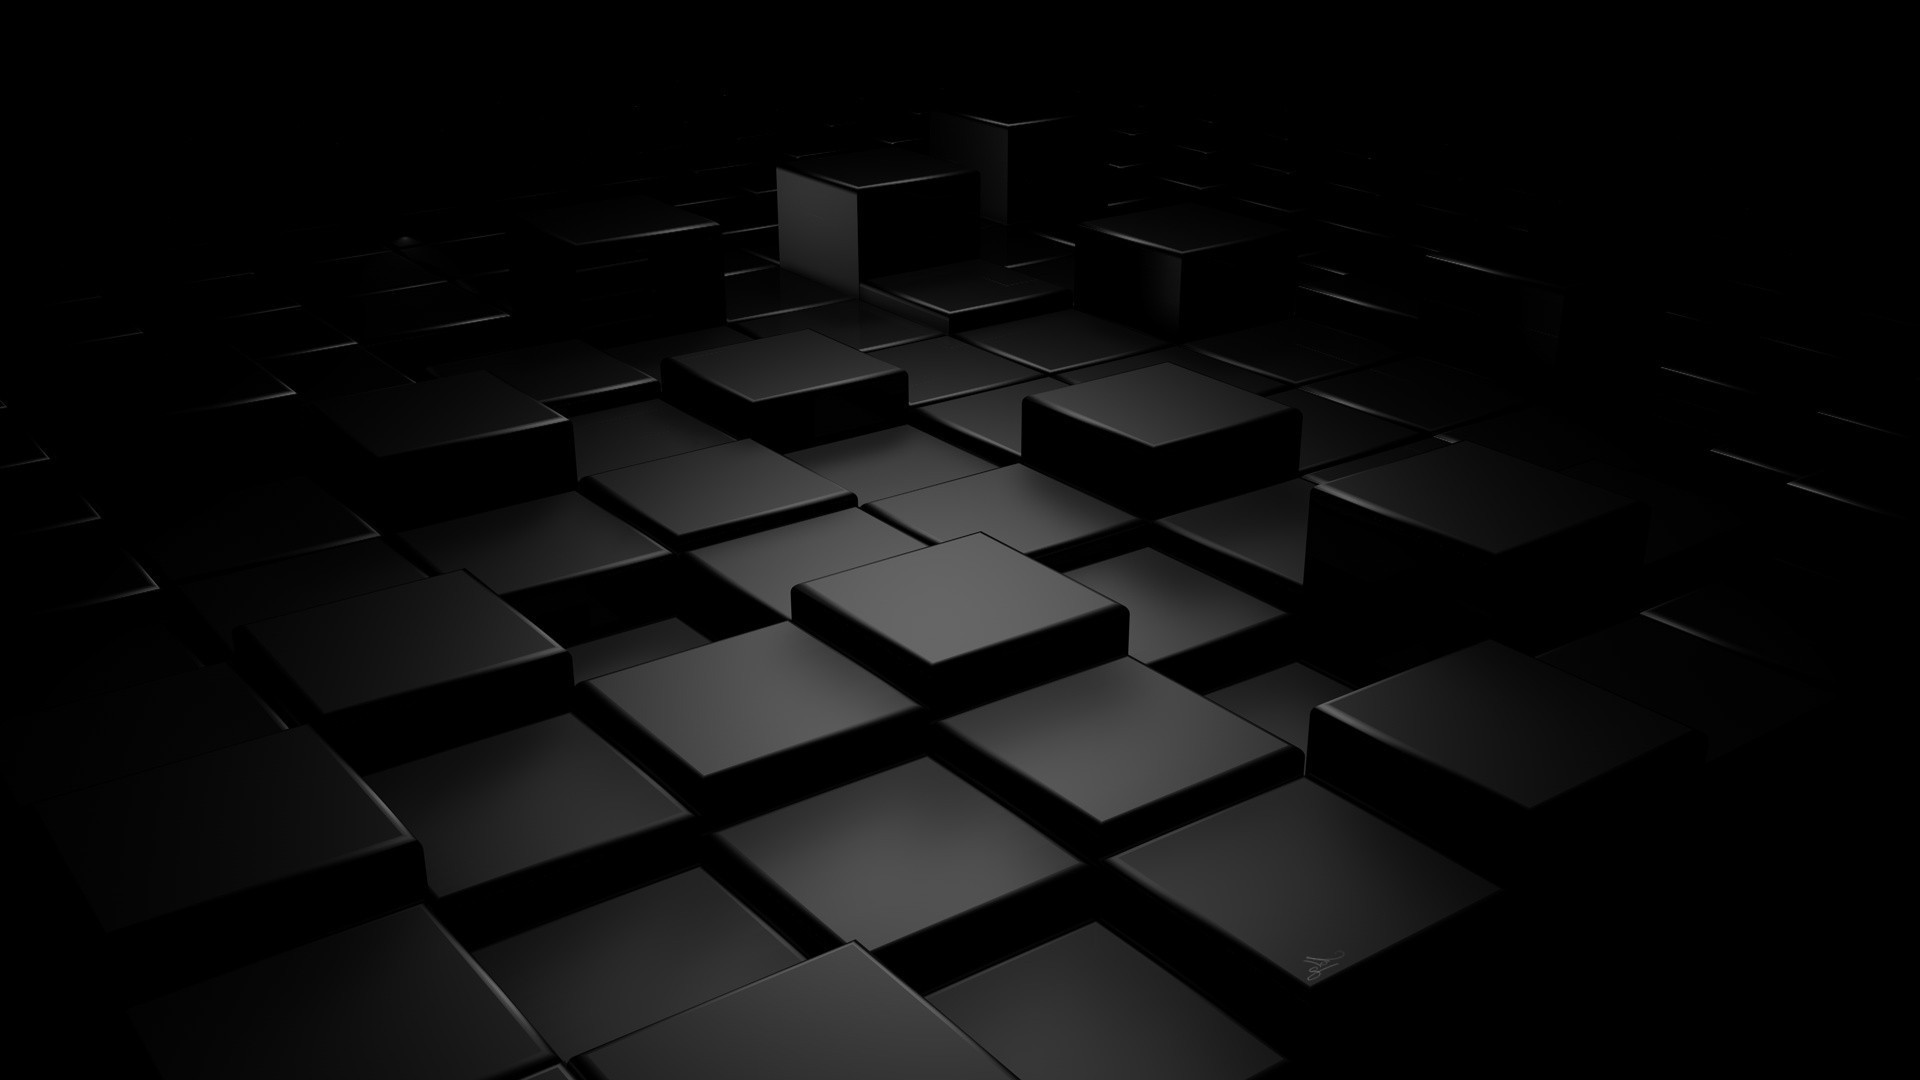 How to Enhance the Looks of Dark Desktop Wallpaper